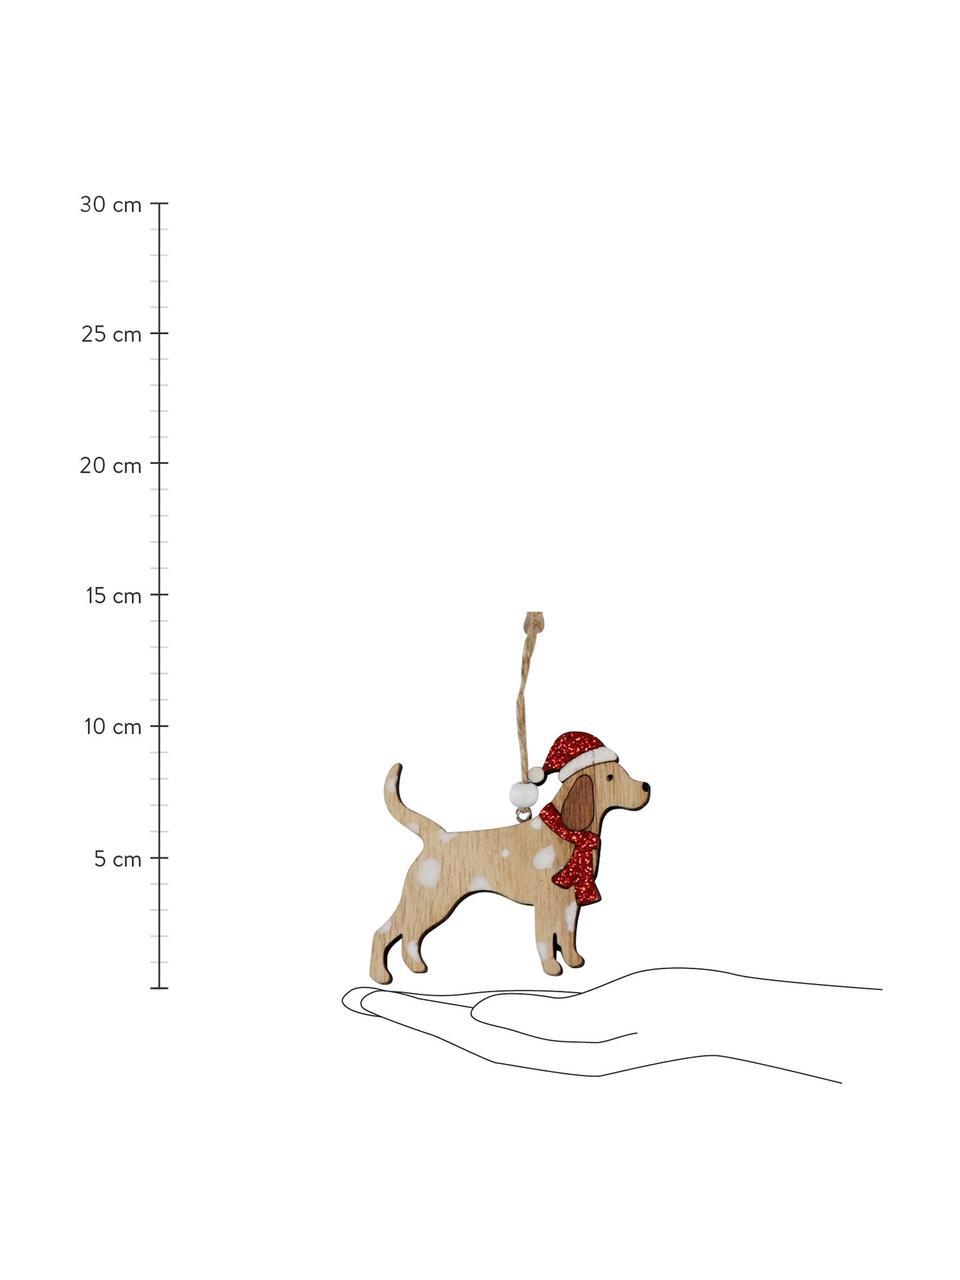 Holz-Baumanhänger-Set Christmas Dogs B 11 cm, 12 Stück, Mehrfarbig, 11 x 8 cm